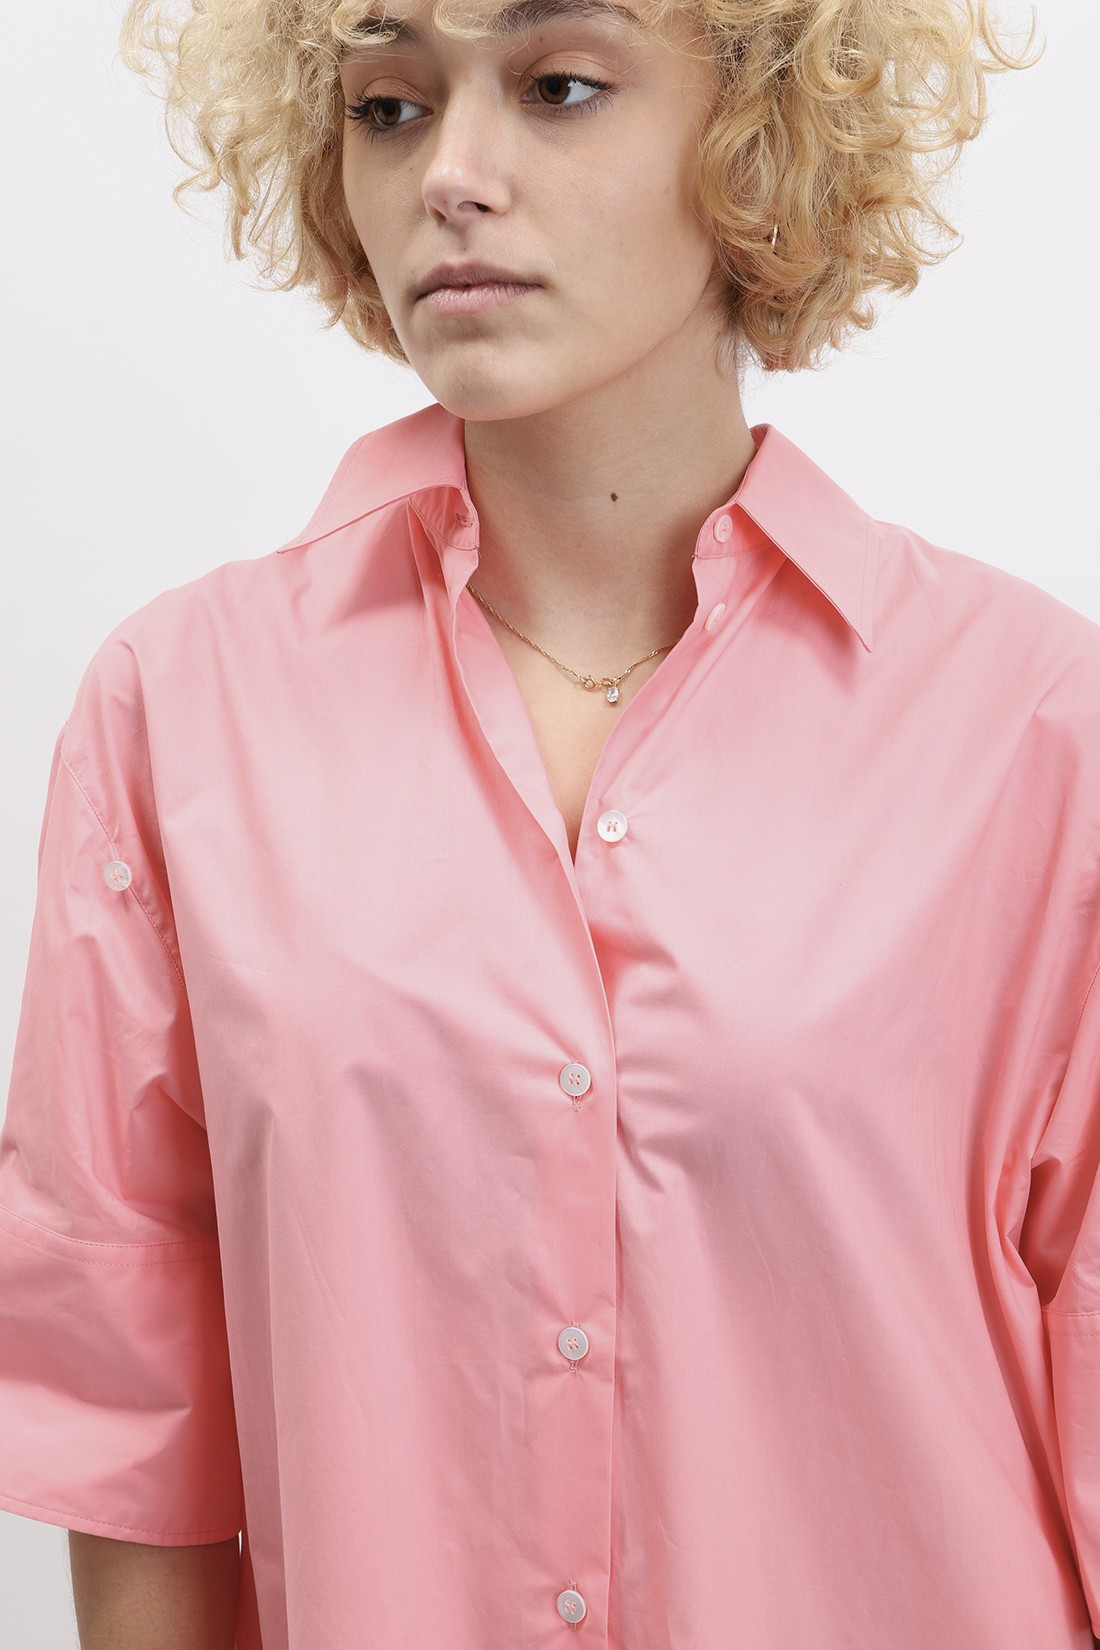 MM6 MAISON MARGIELA / Dress Pink